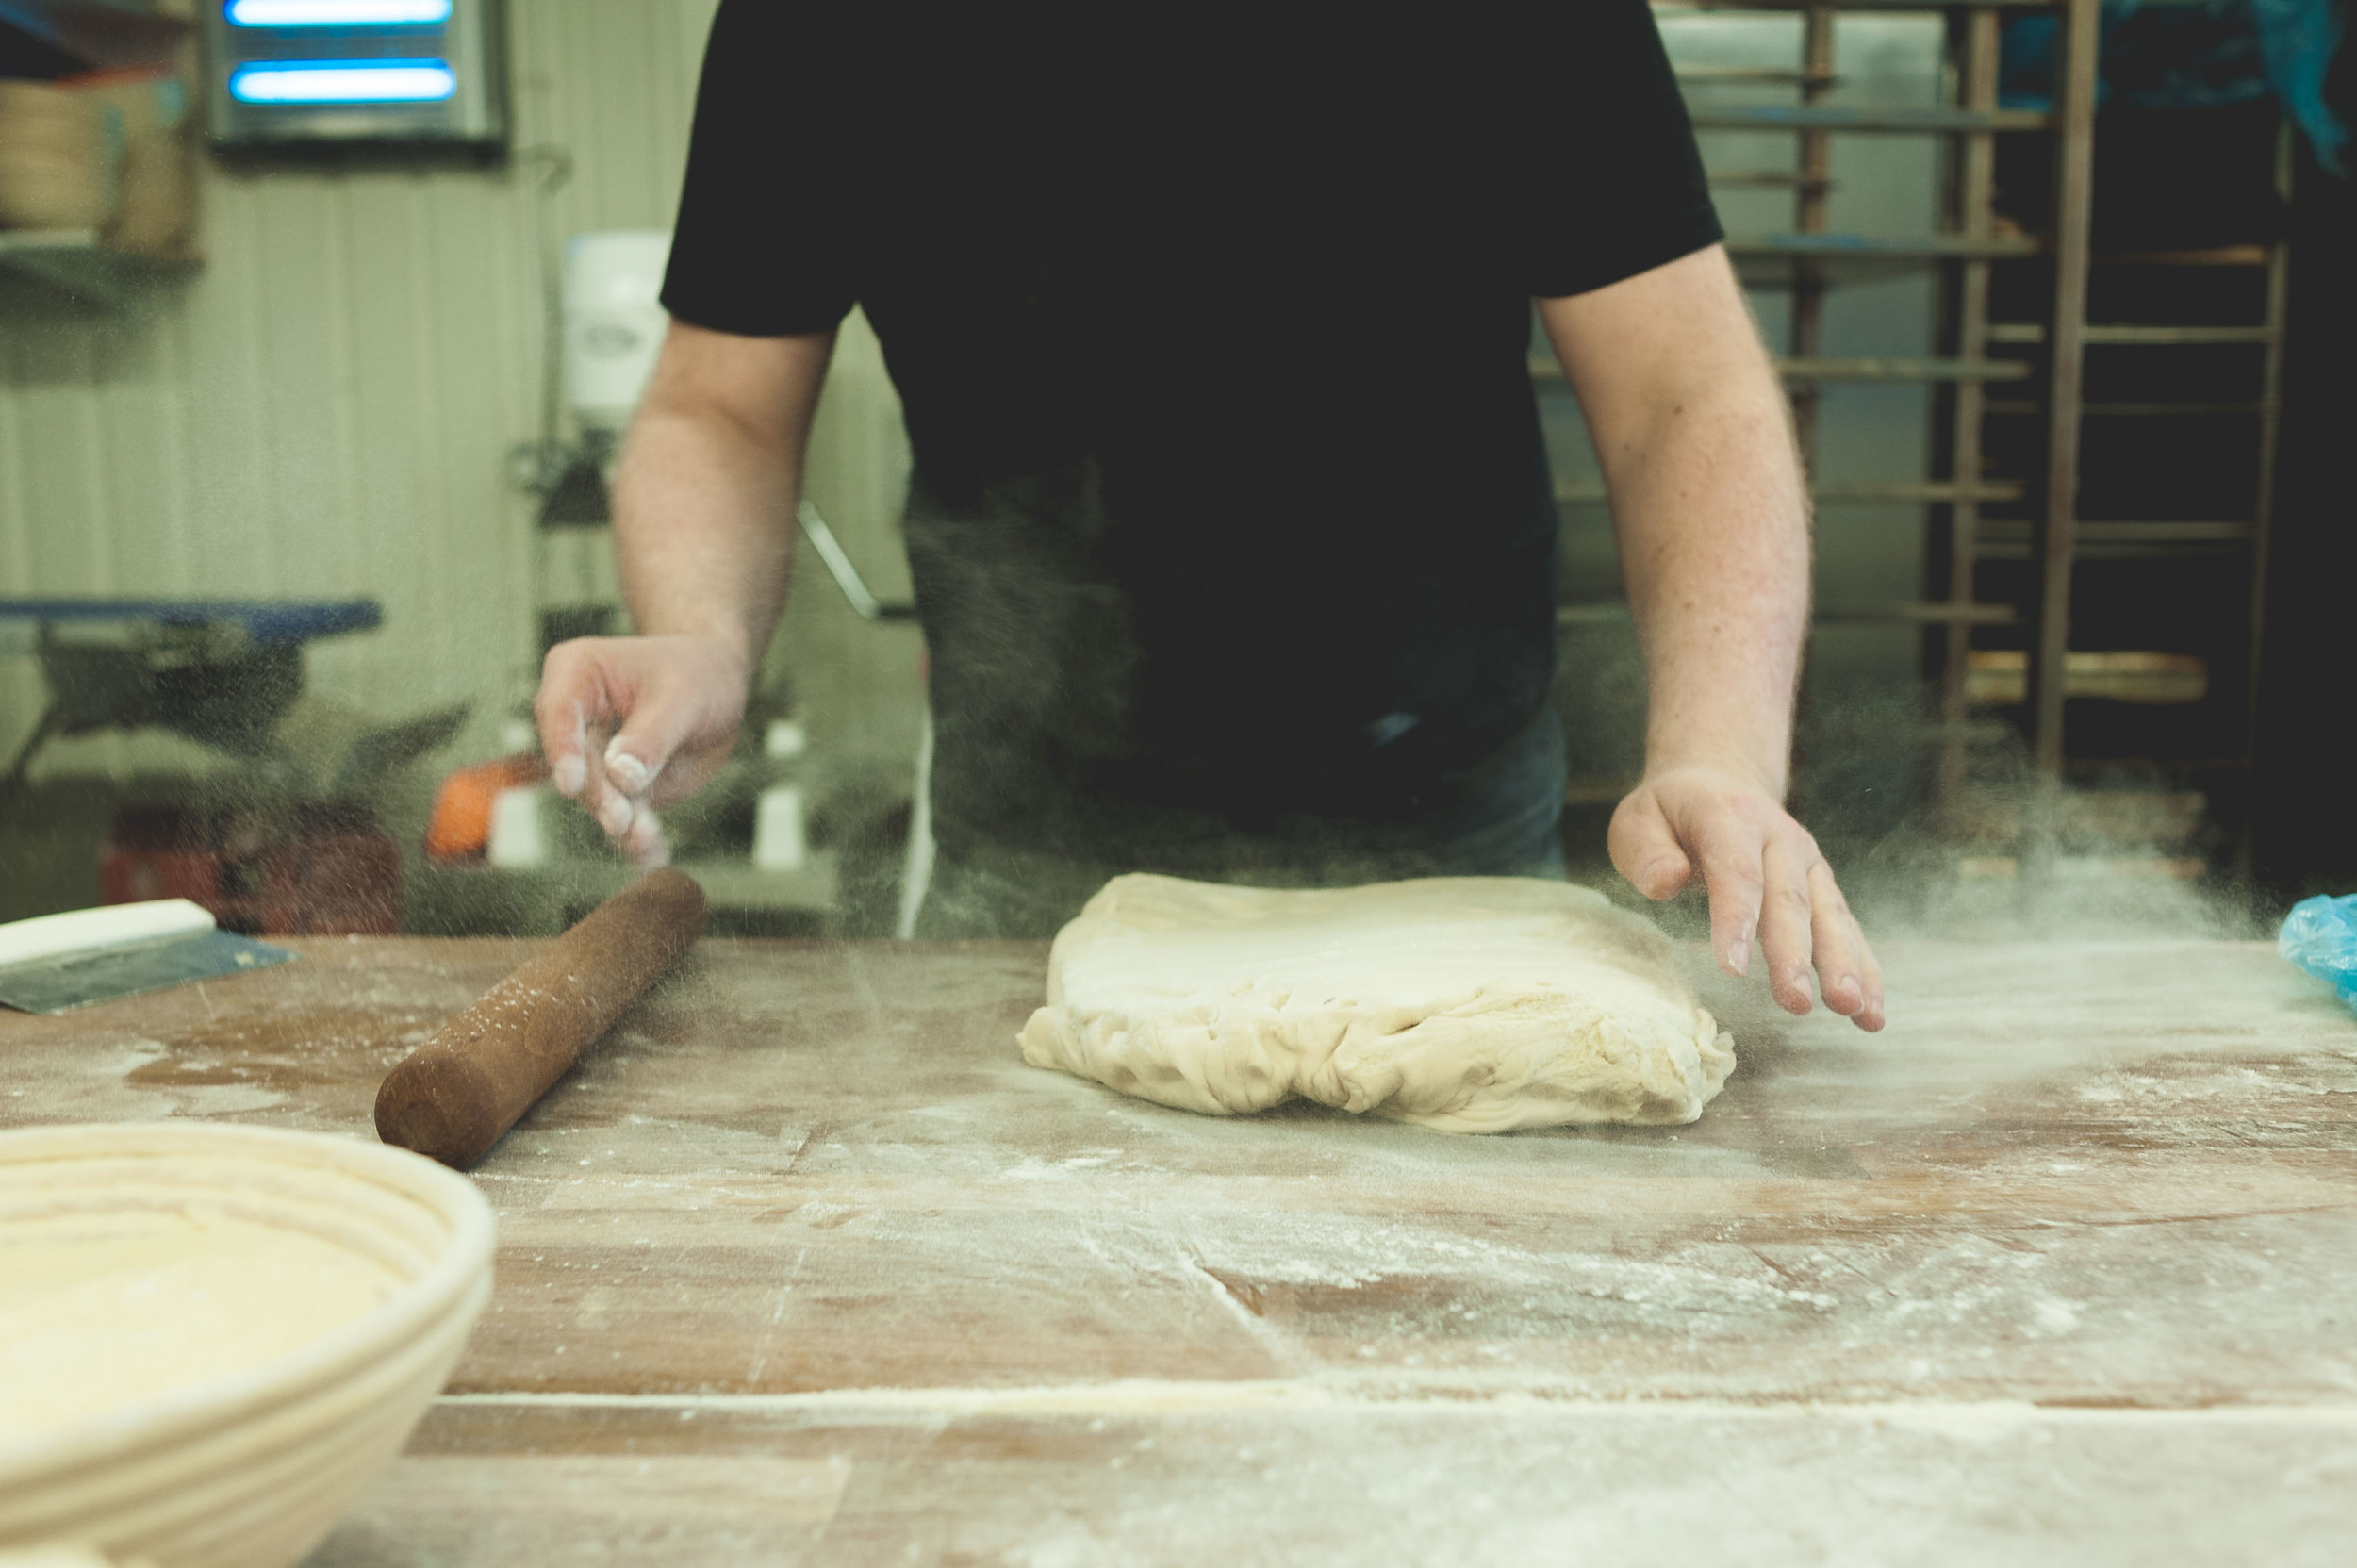 bread-forming-dough-shaping.jpg